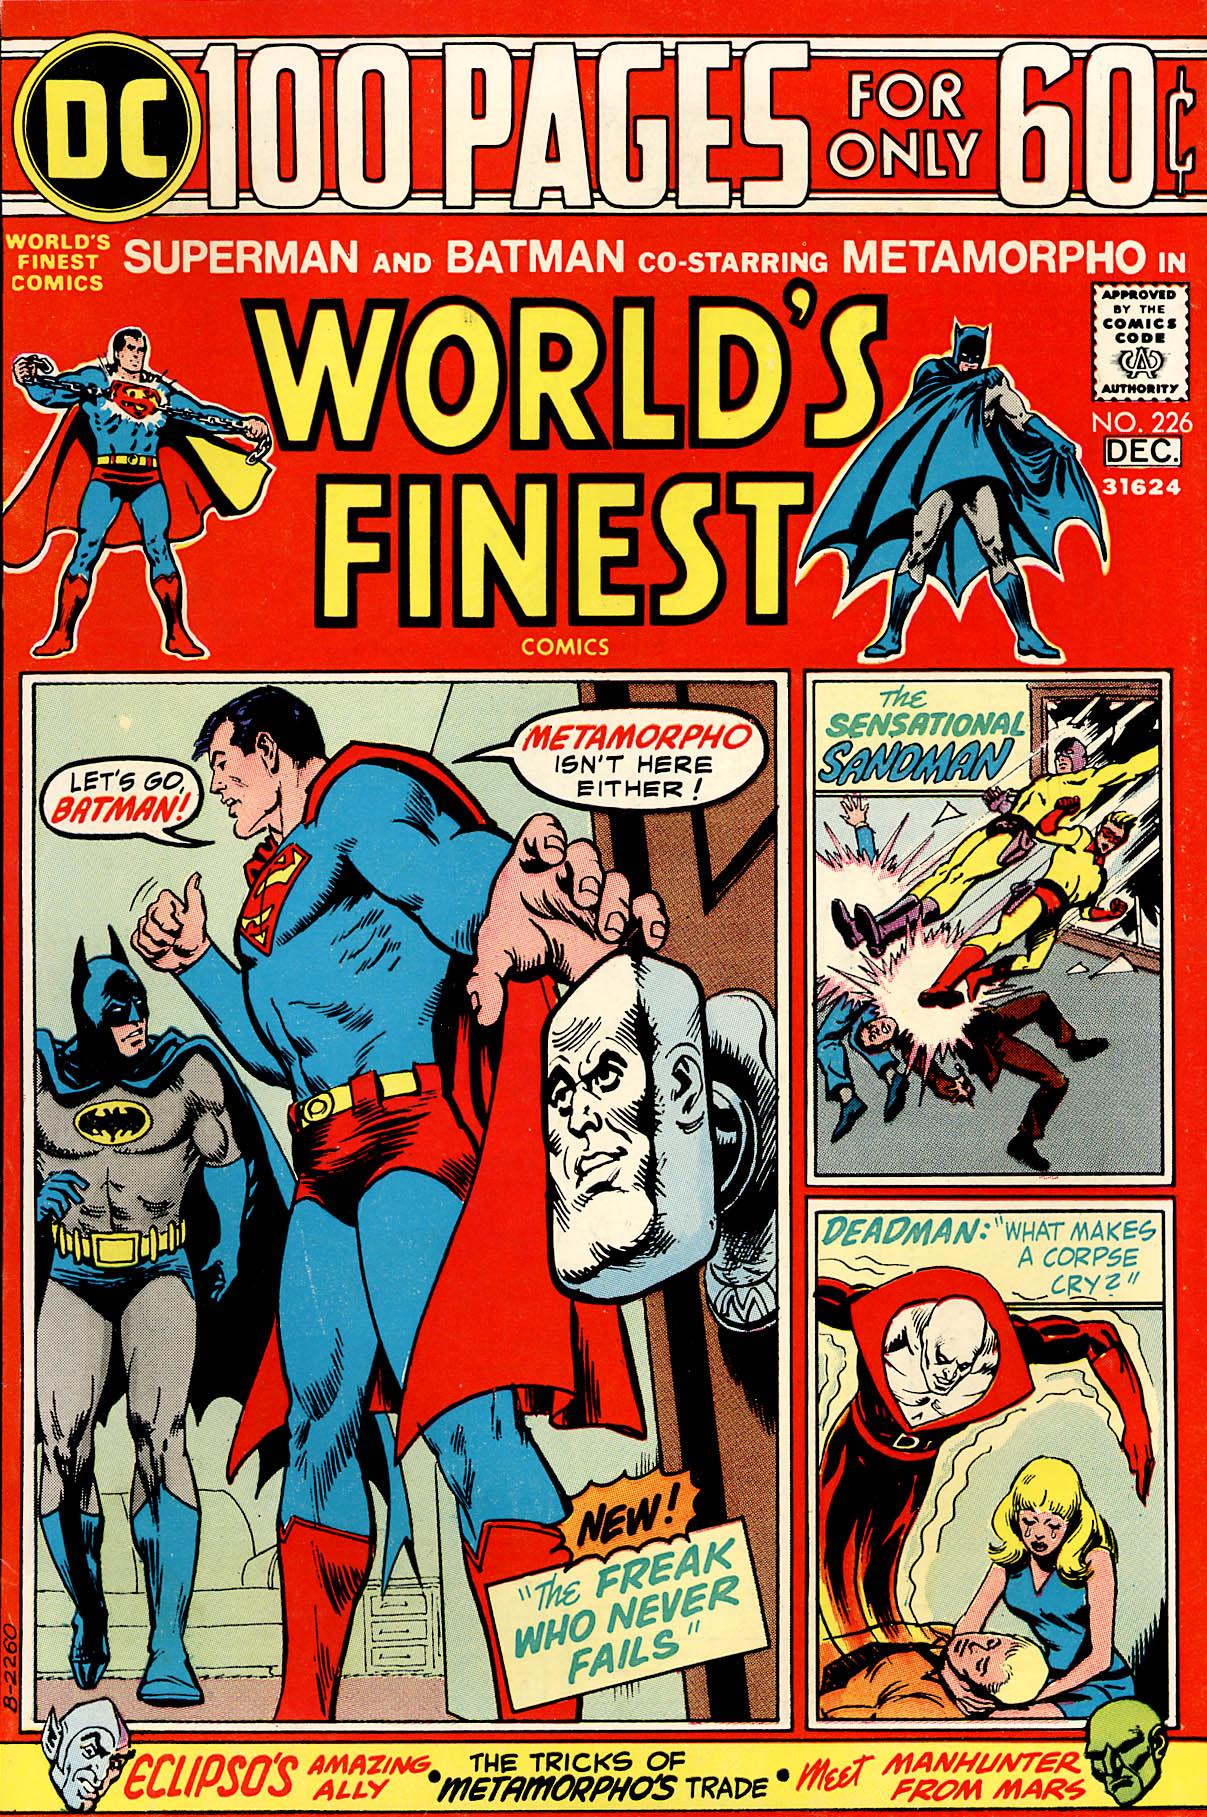 Read online World's Finest Comics comic -  Issue #226 - 1